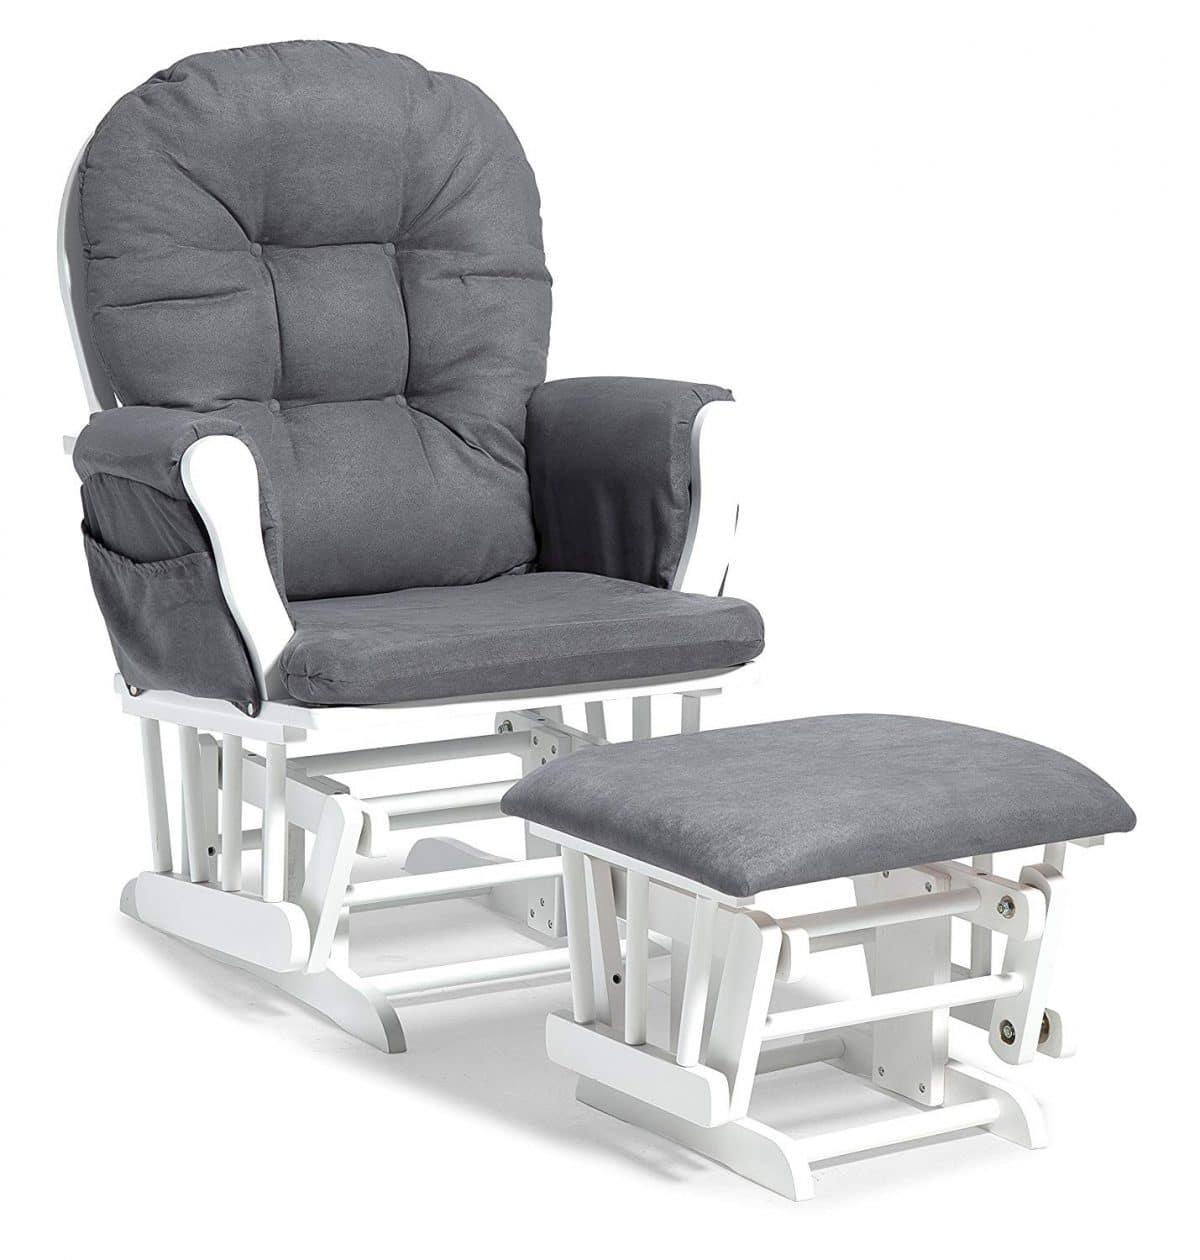 Tremendous The 10 Best Nursing Gliders To Buy 2019 Littleonemag Uwap Interior Chair Design Uwaporg